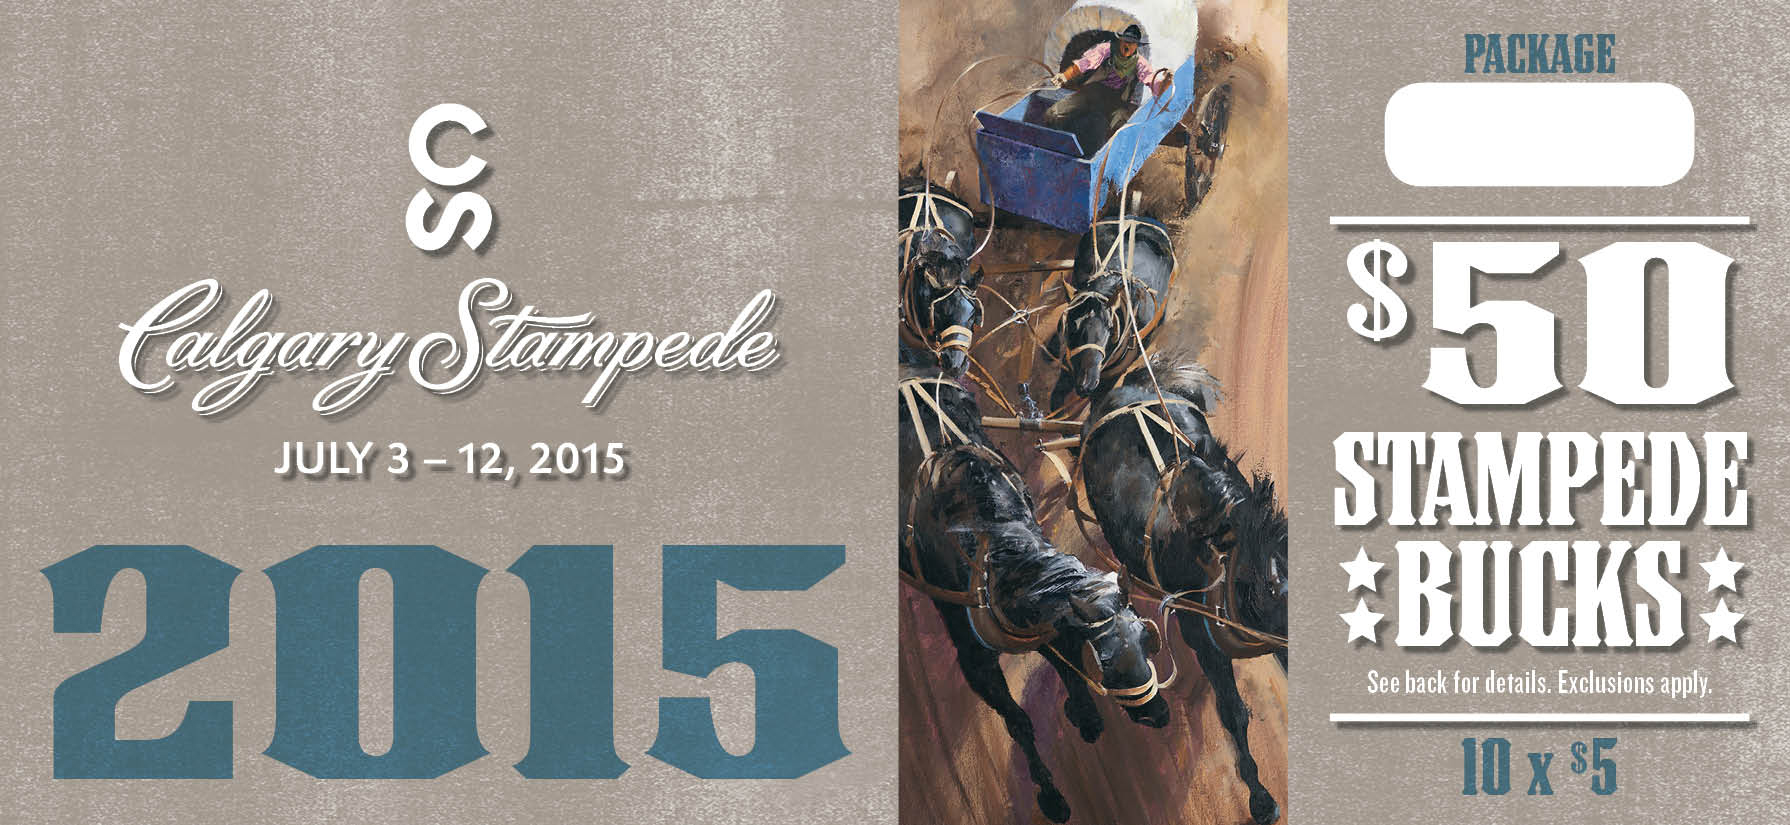 Value Deals Calgary Stampede 2015